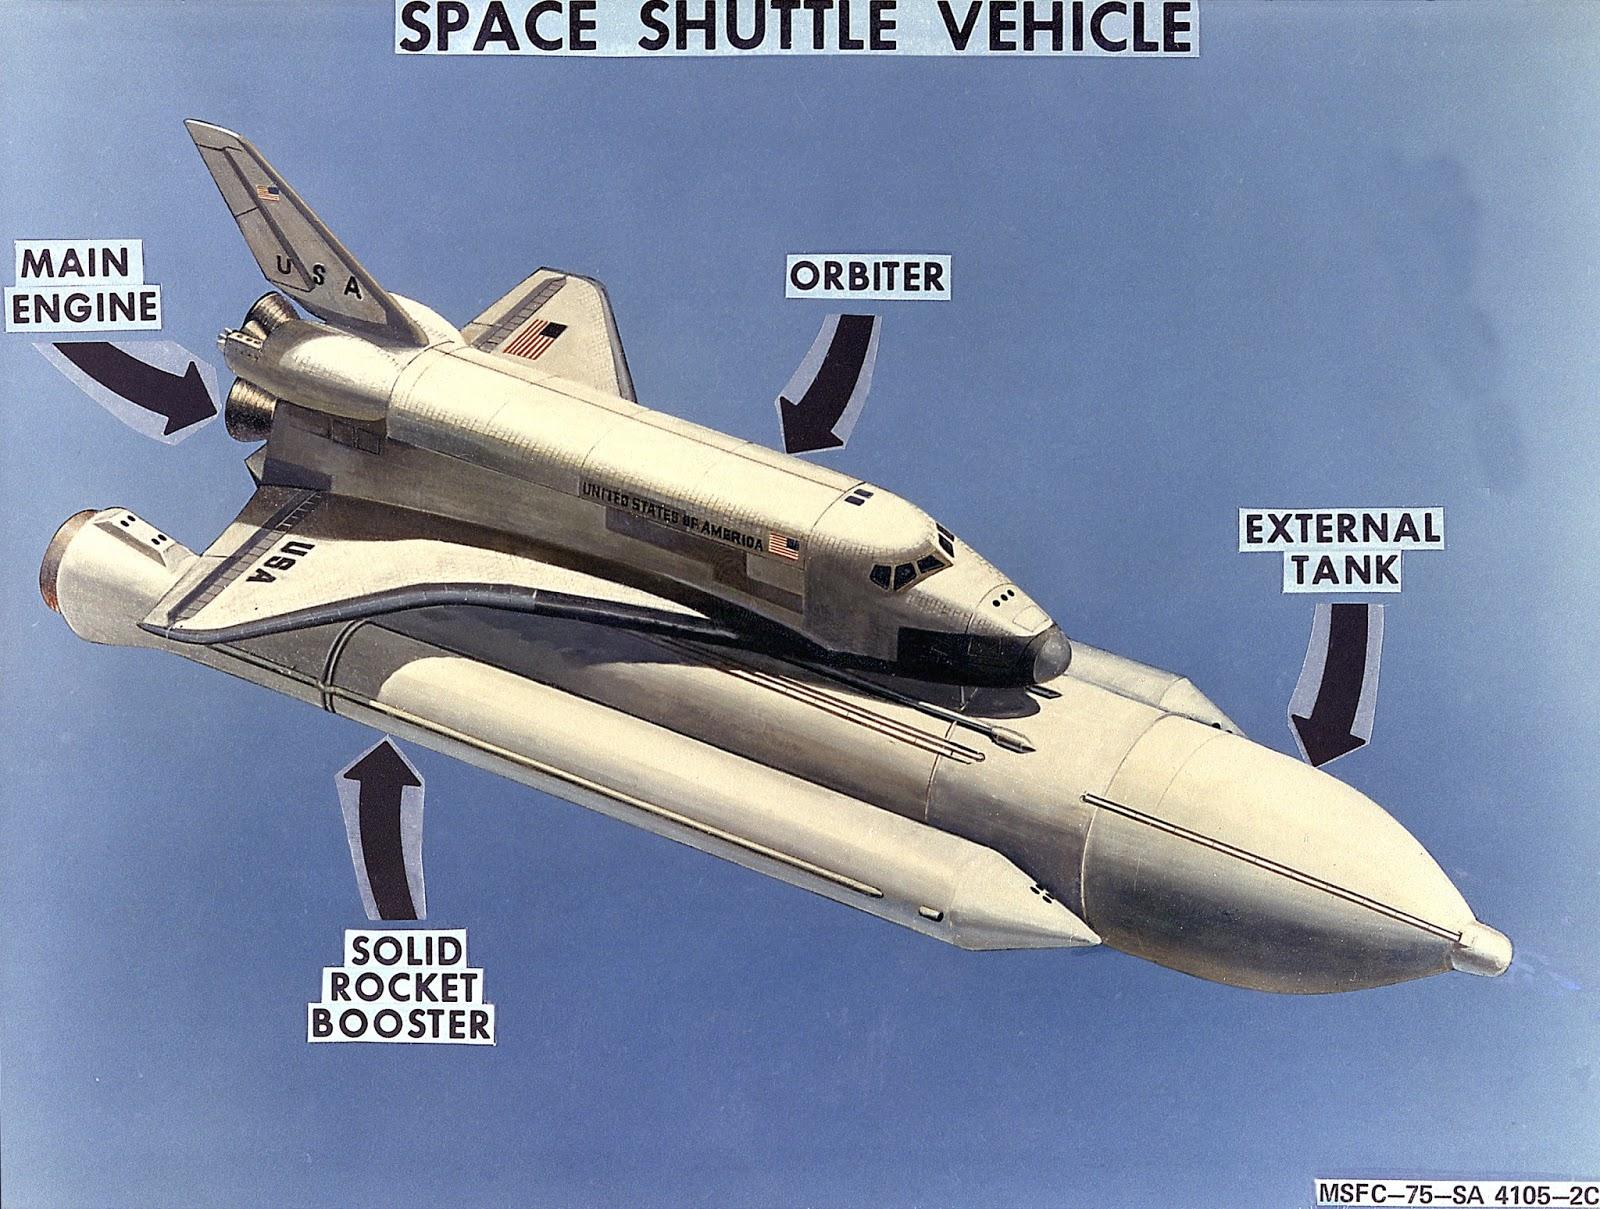 Nasa space shuttle in orbit